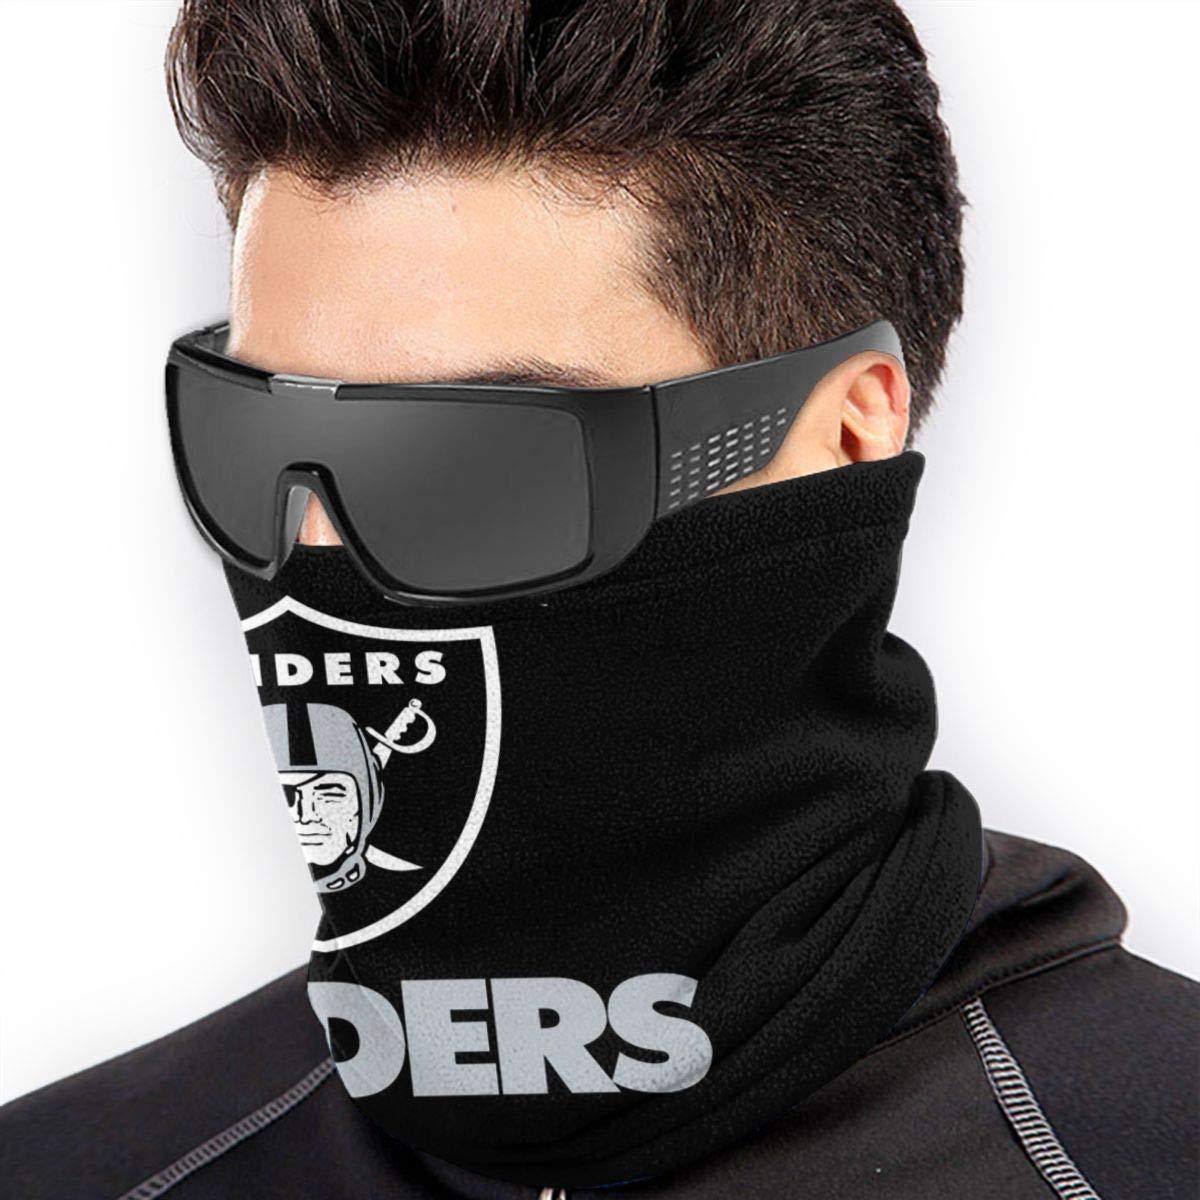 Neck Gaiter Head Scarf Magic Scarf Sorcerer Design Men Women Headwear Neck Warmer Scarf Dallas Cowboys Football Team Bandana Microfiber Face Mask,Headband Balaclava